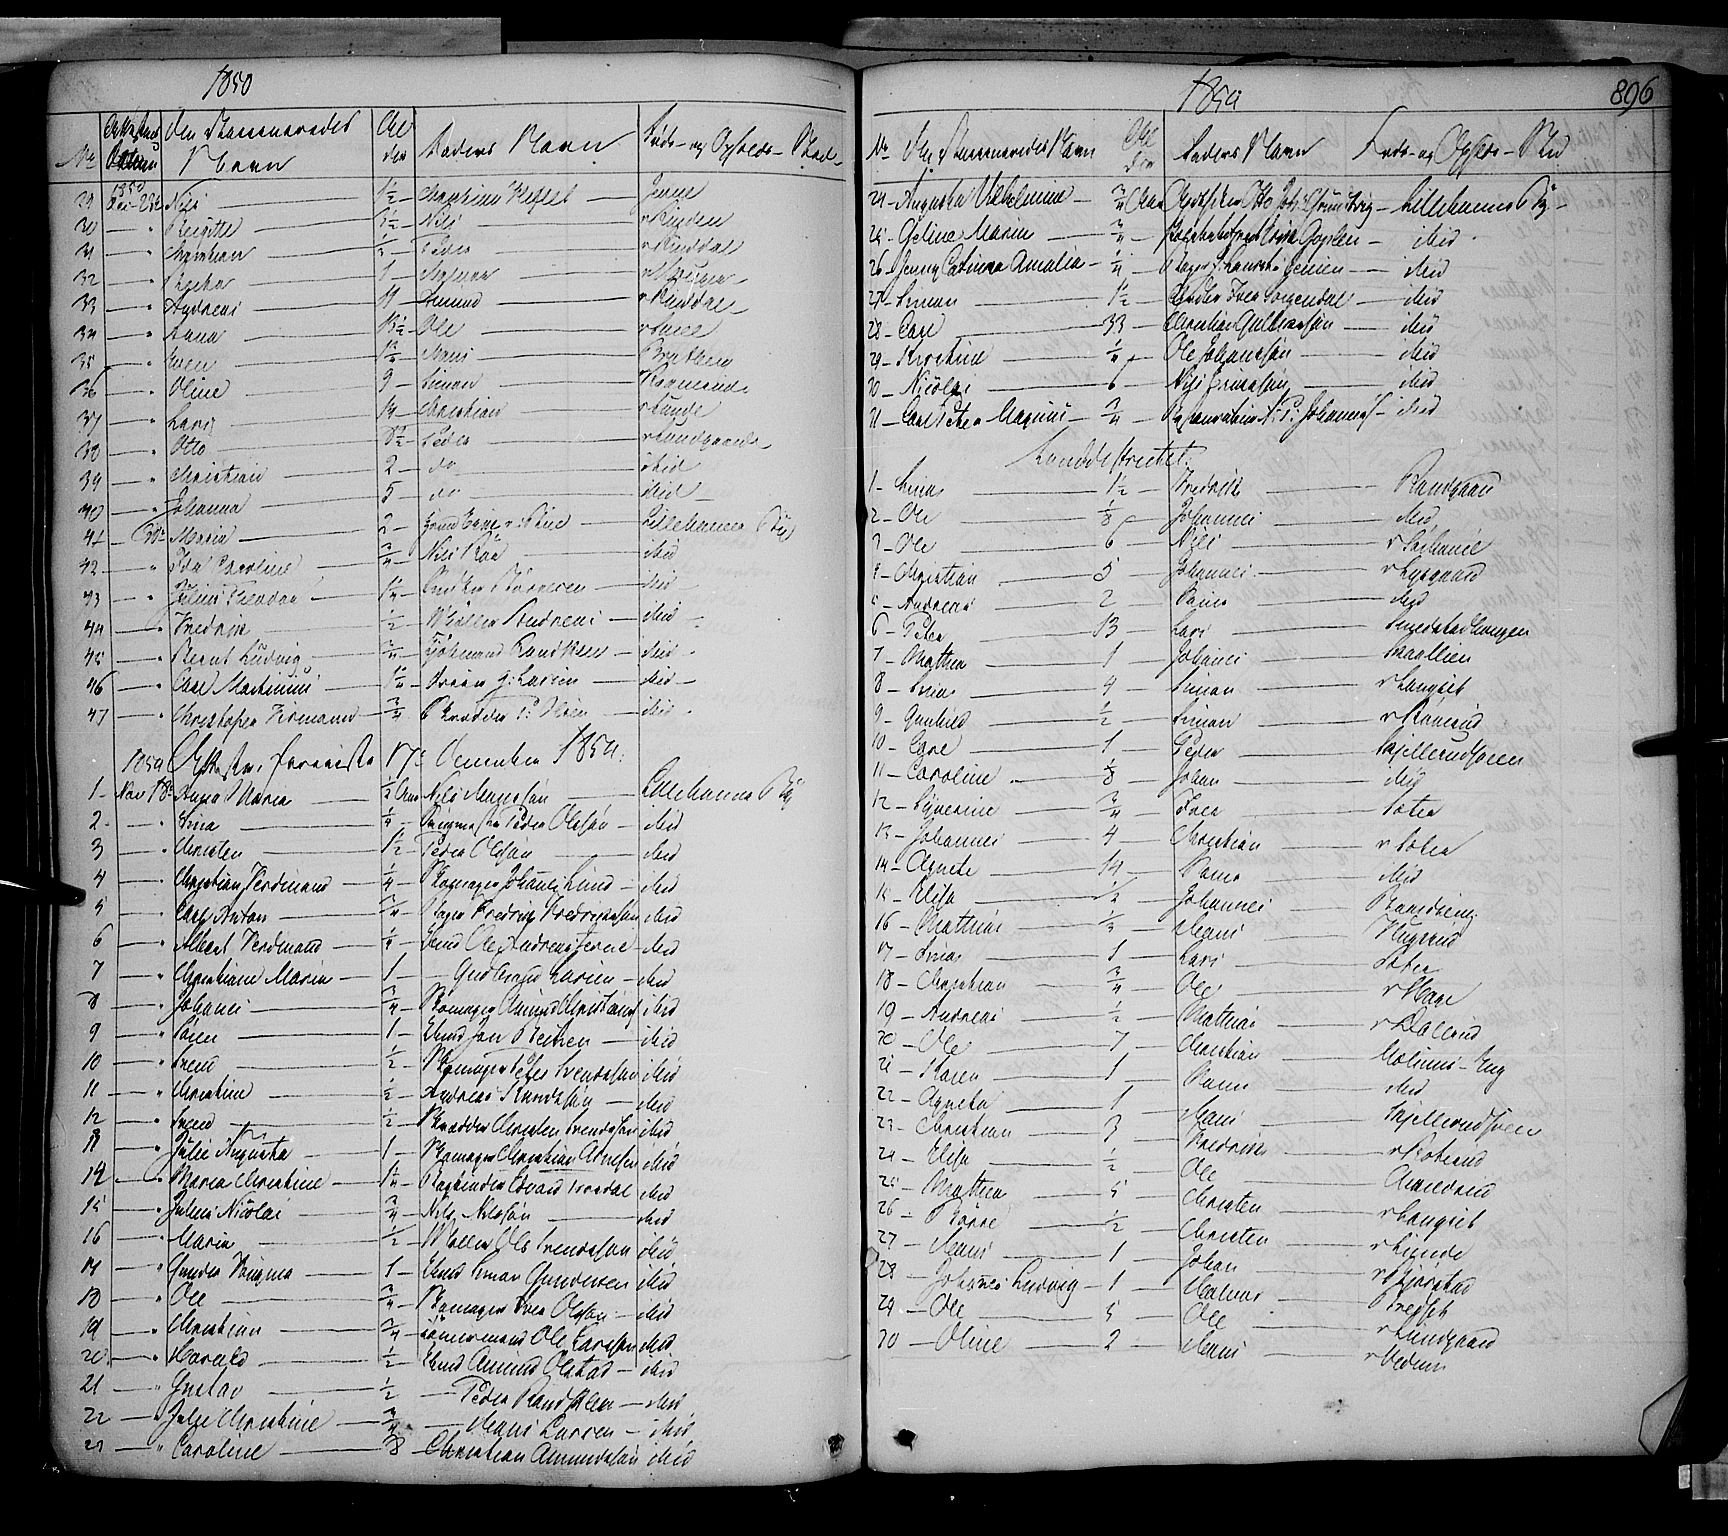 SAH, Fåberg prestekontor, Ministerialbok nr. 5, 1836-1854, s. 895-896